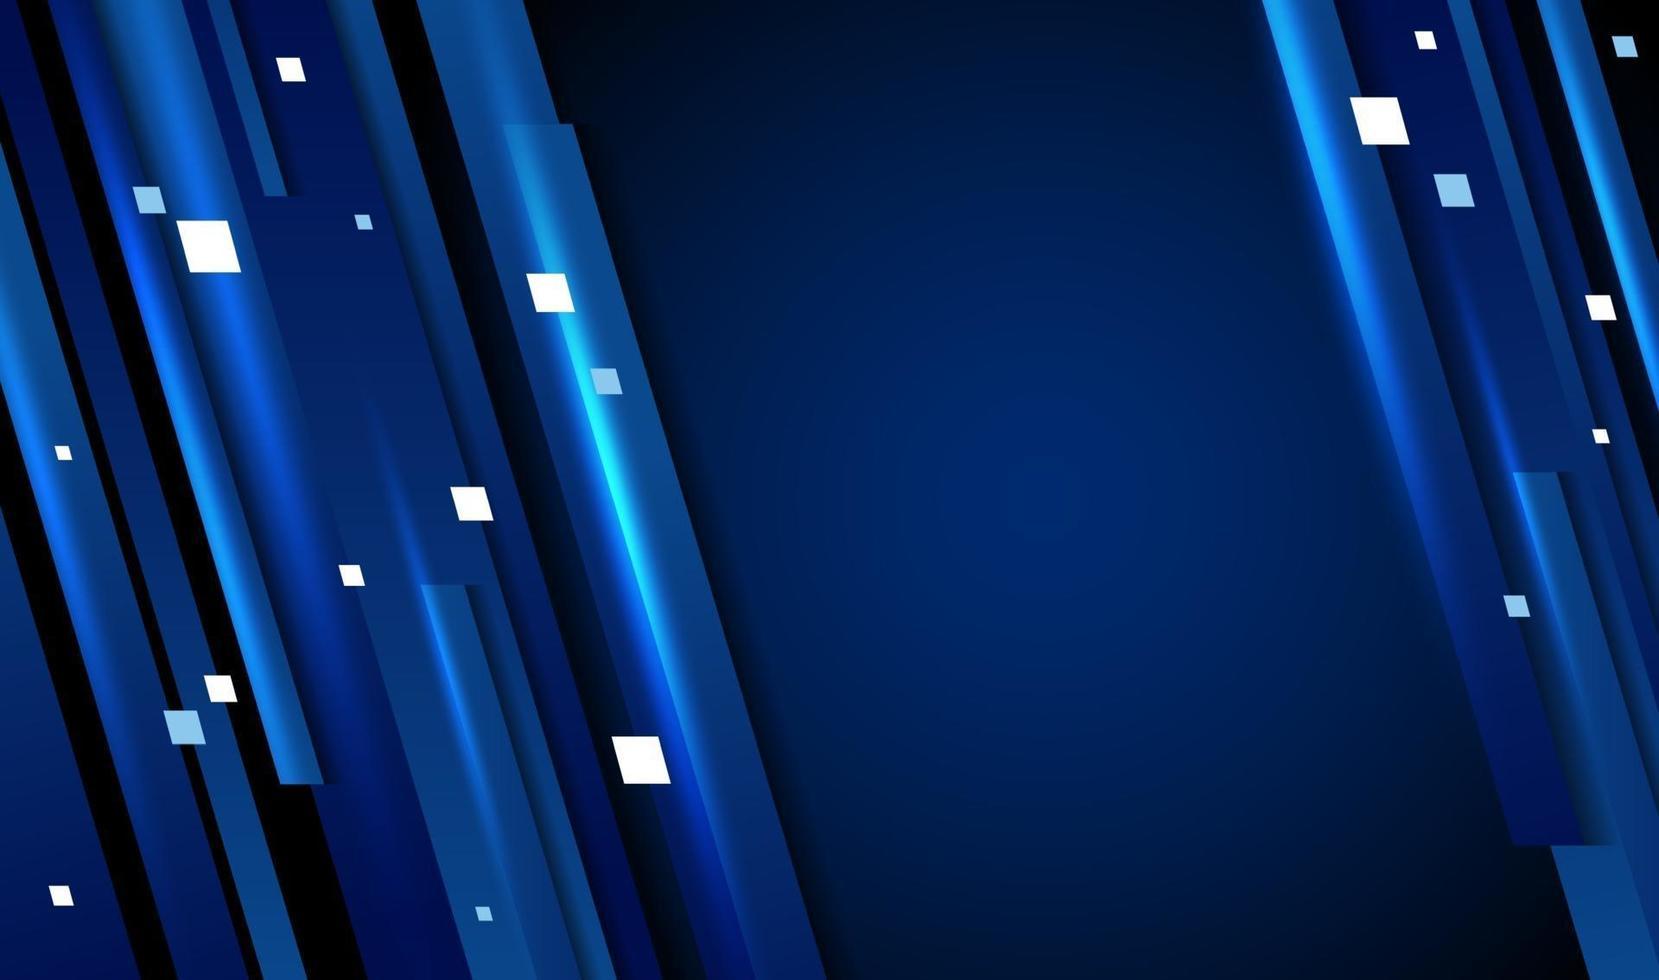 abstrakte digitale Technologie Hintergrundvektorillustration vektor